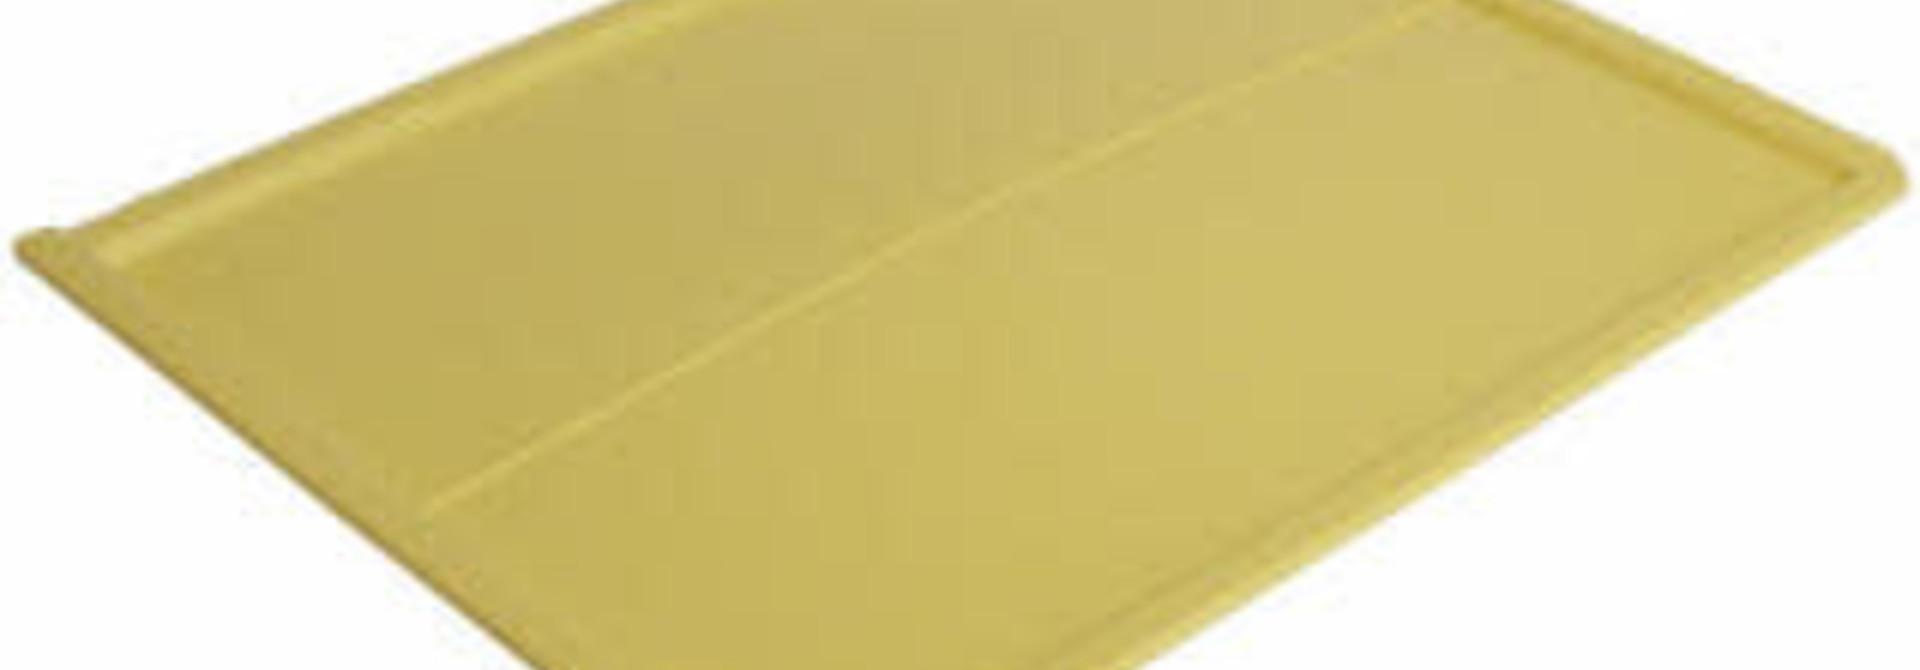 Bodemlade Nicot DB10